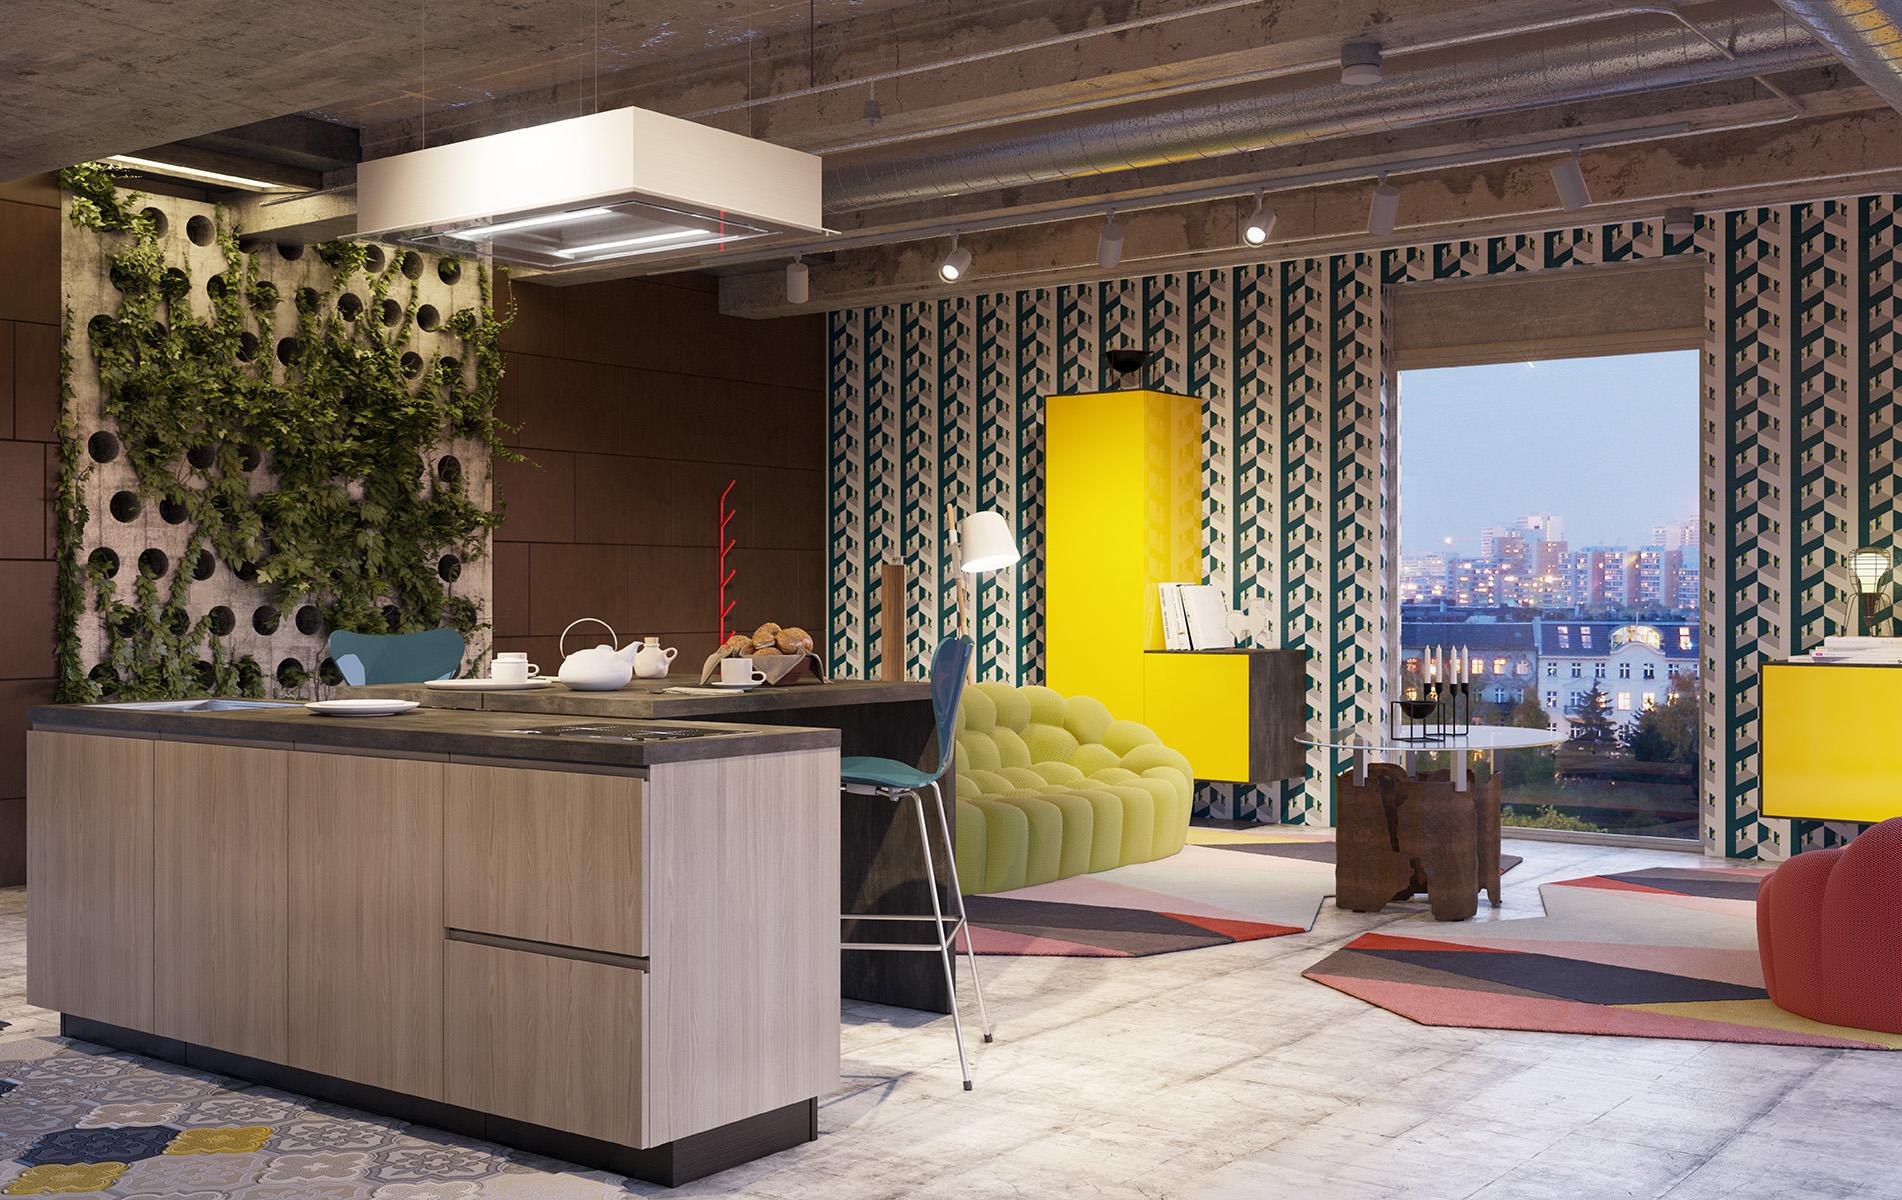 Amalfi Full, la nuova cucina firmata Del Tongo